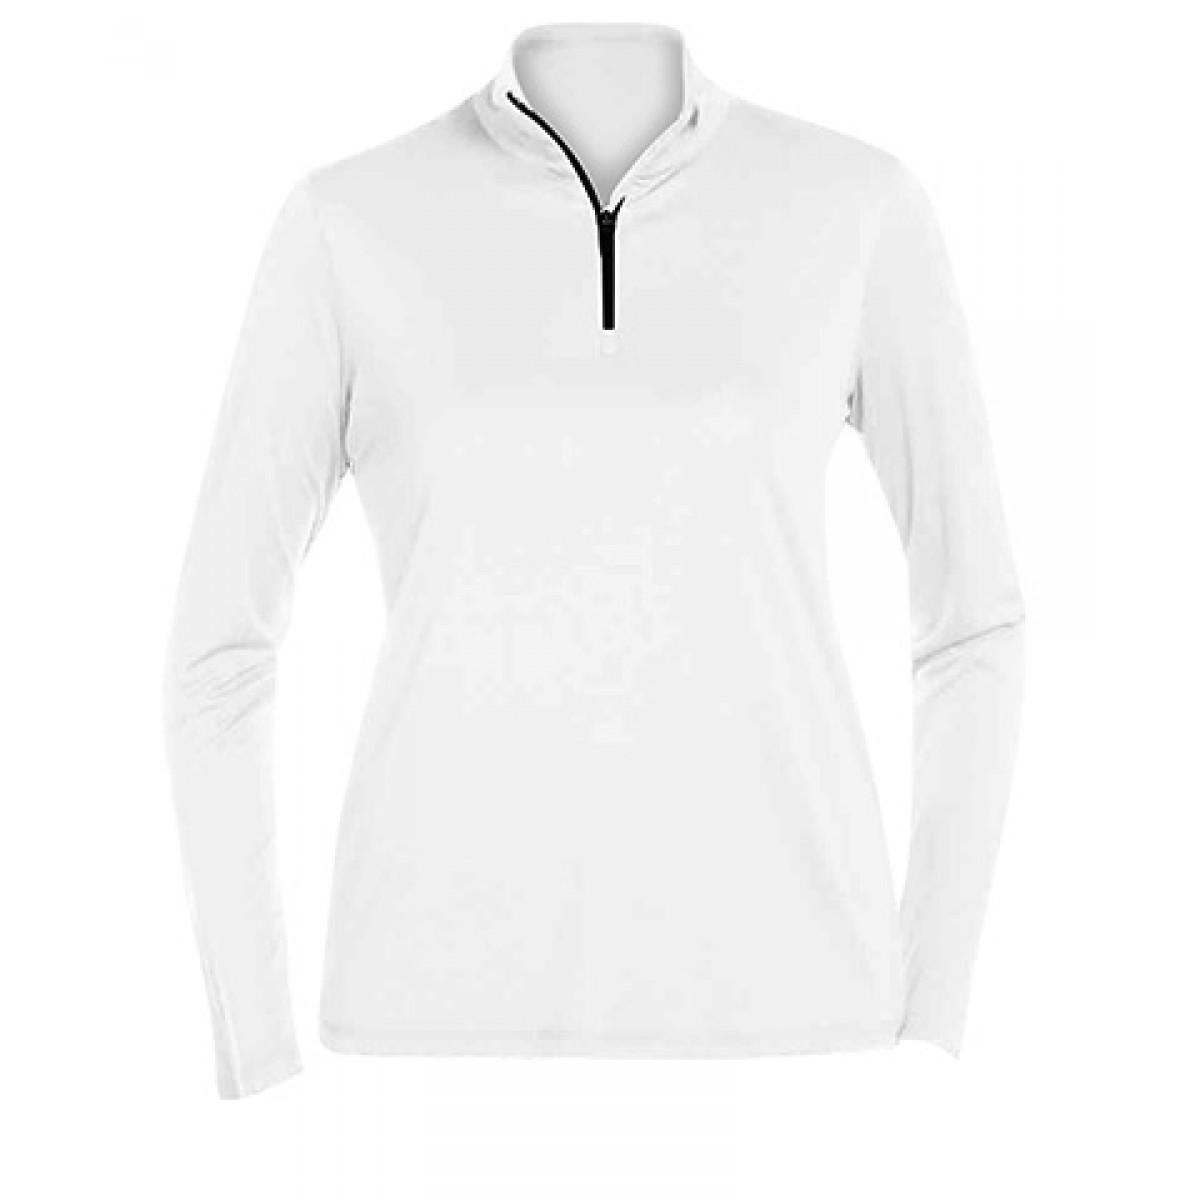 Ladies' Quarter-Zip Lightweight Pullover-White-S